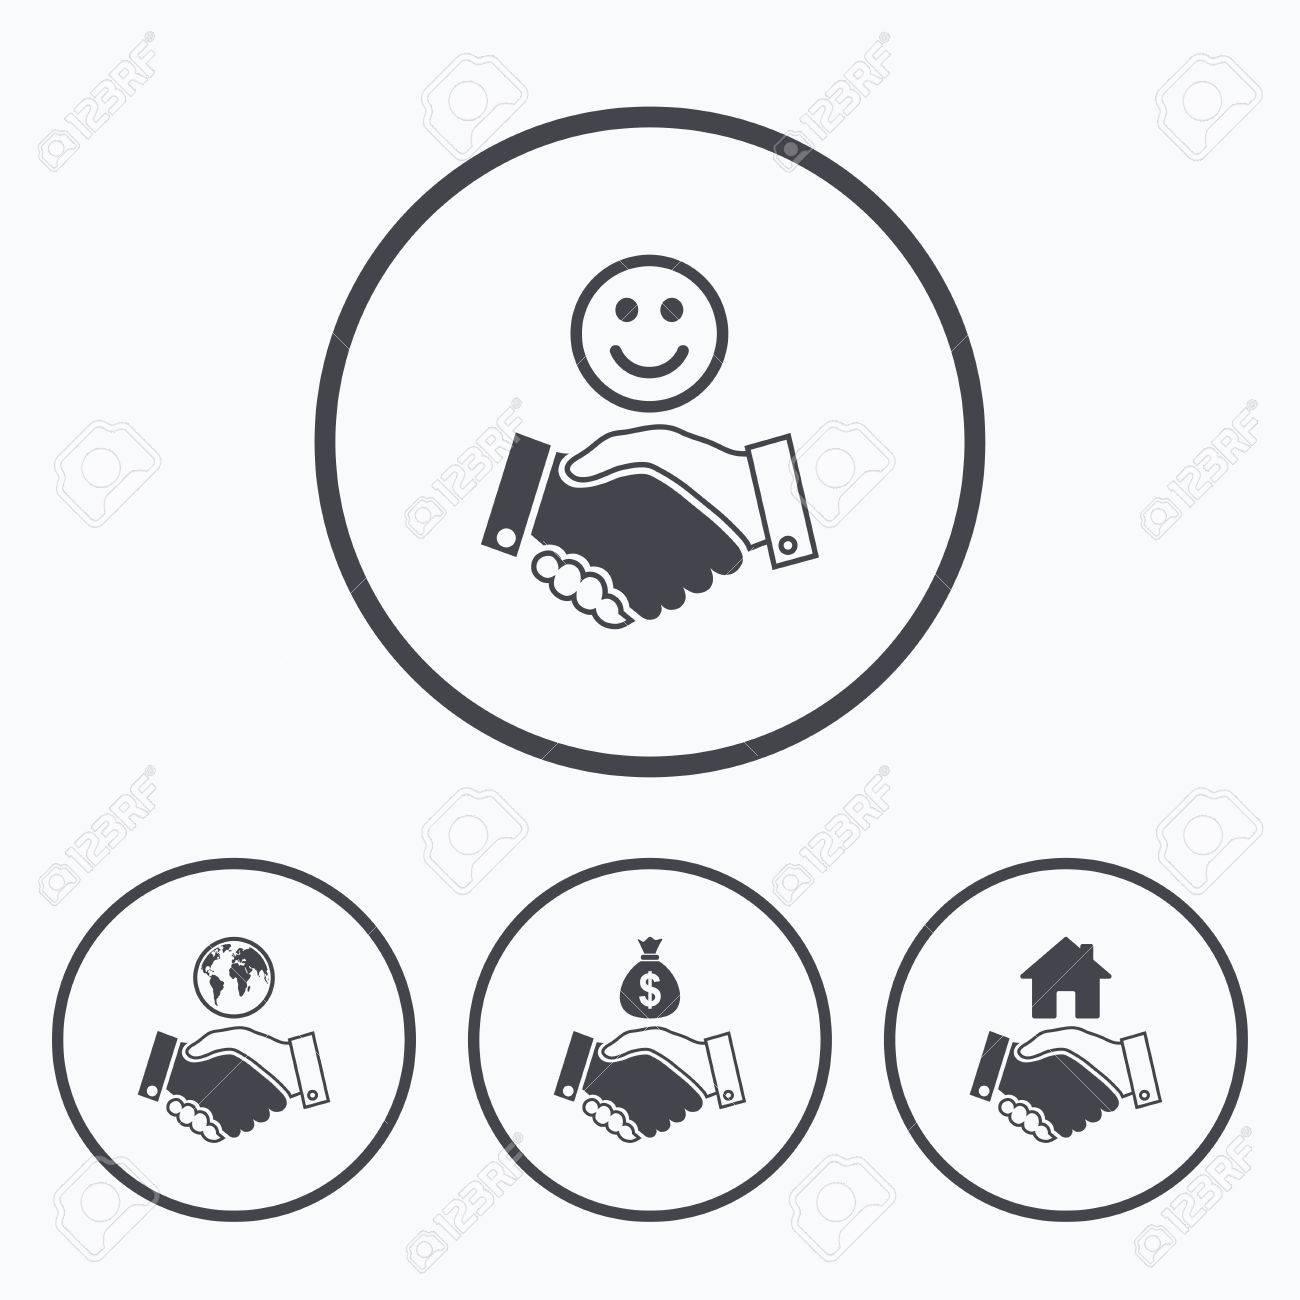 Handshake icons world smile happy face and house building symbol world smile happy face and house building symbol dollar cash money biocorpaavc